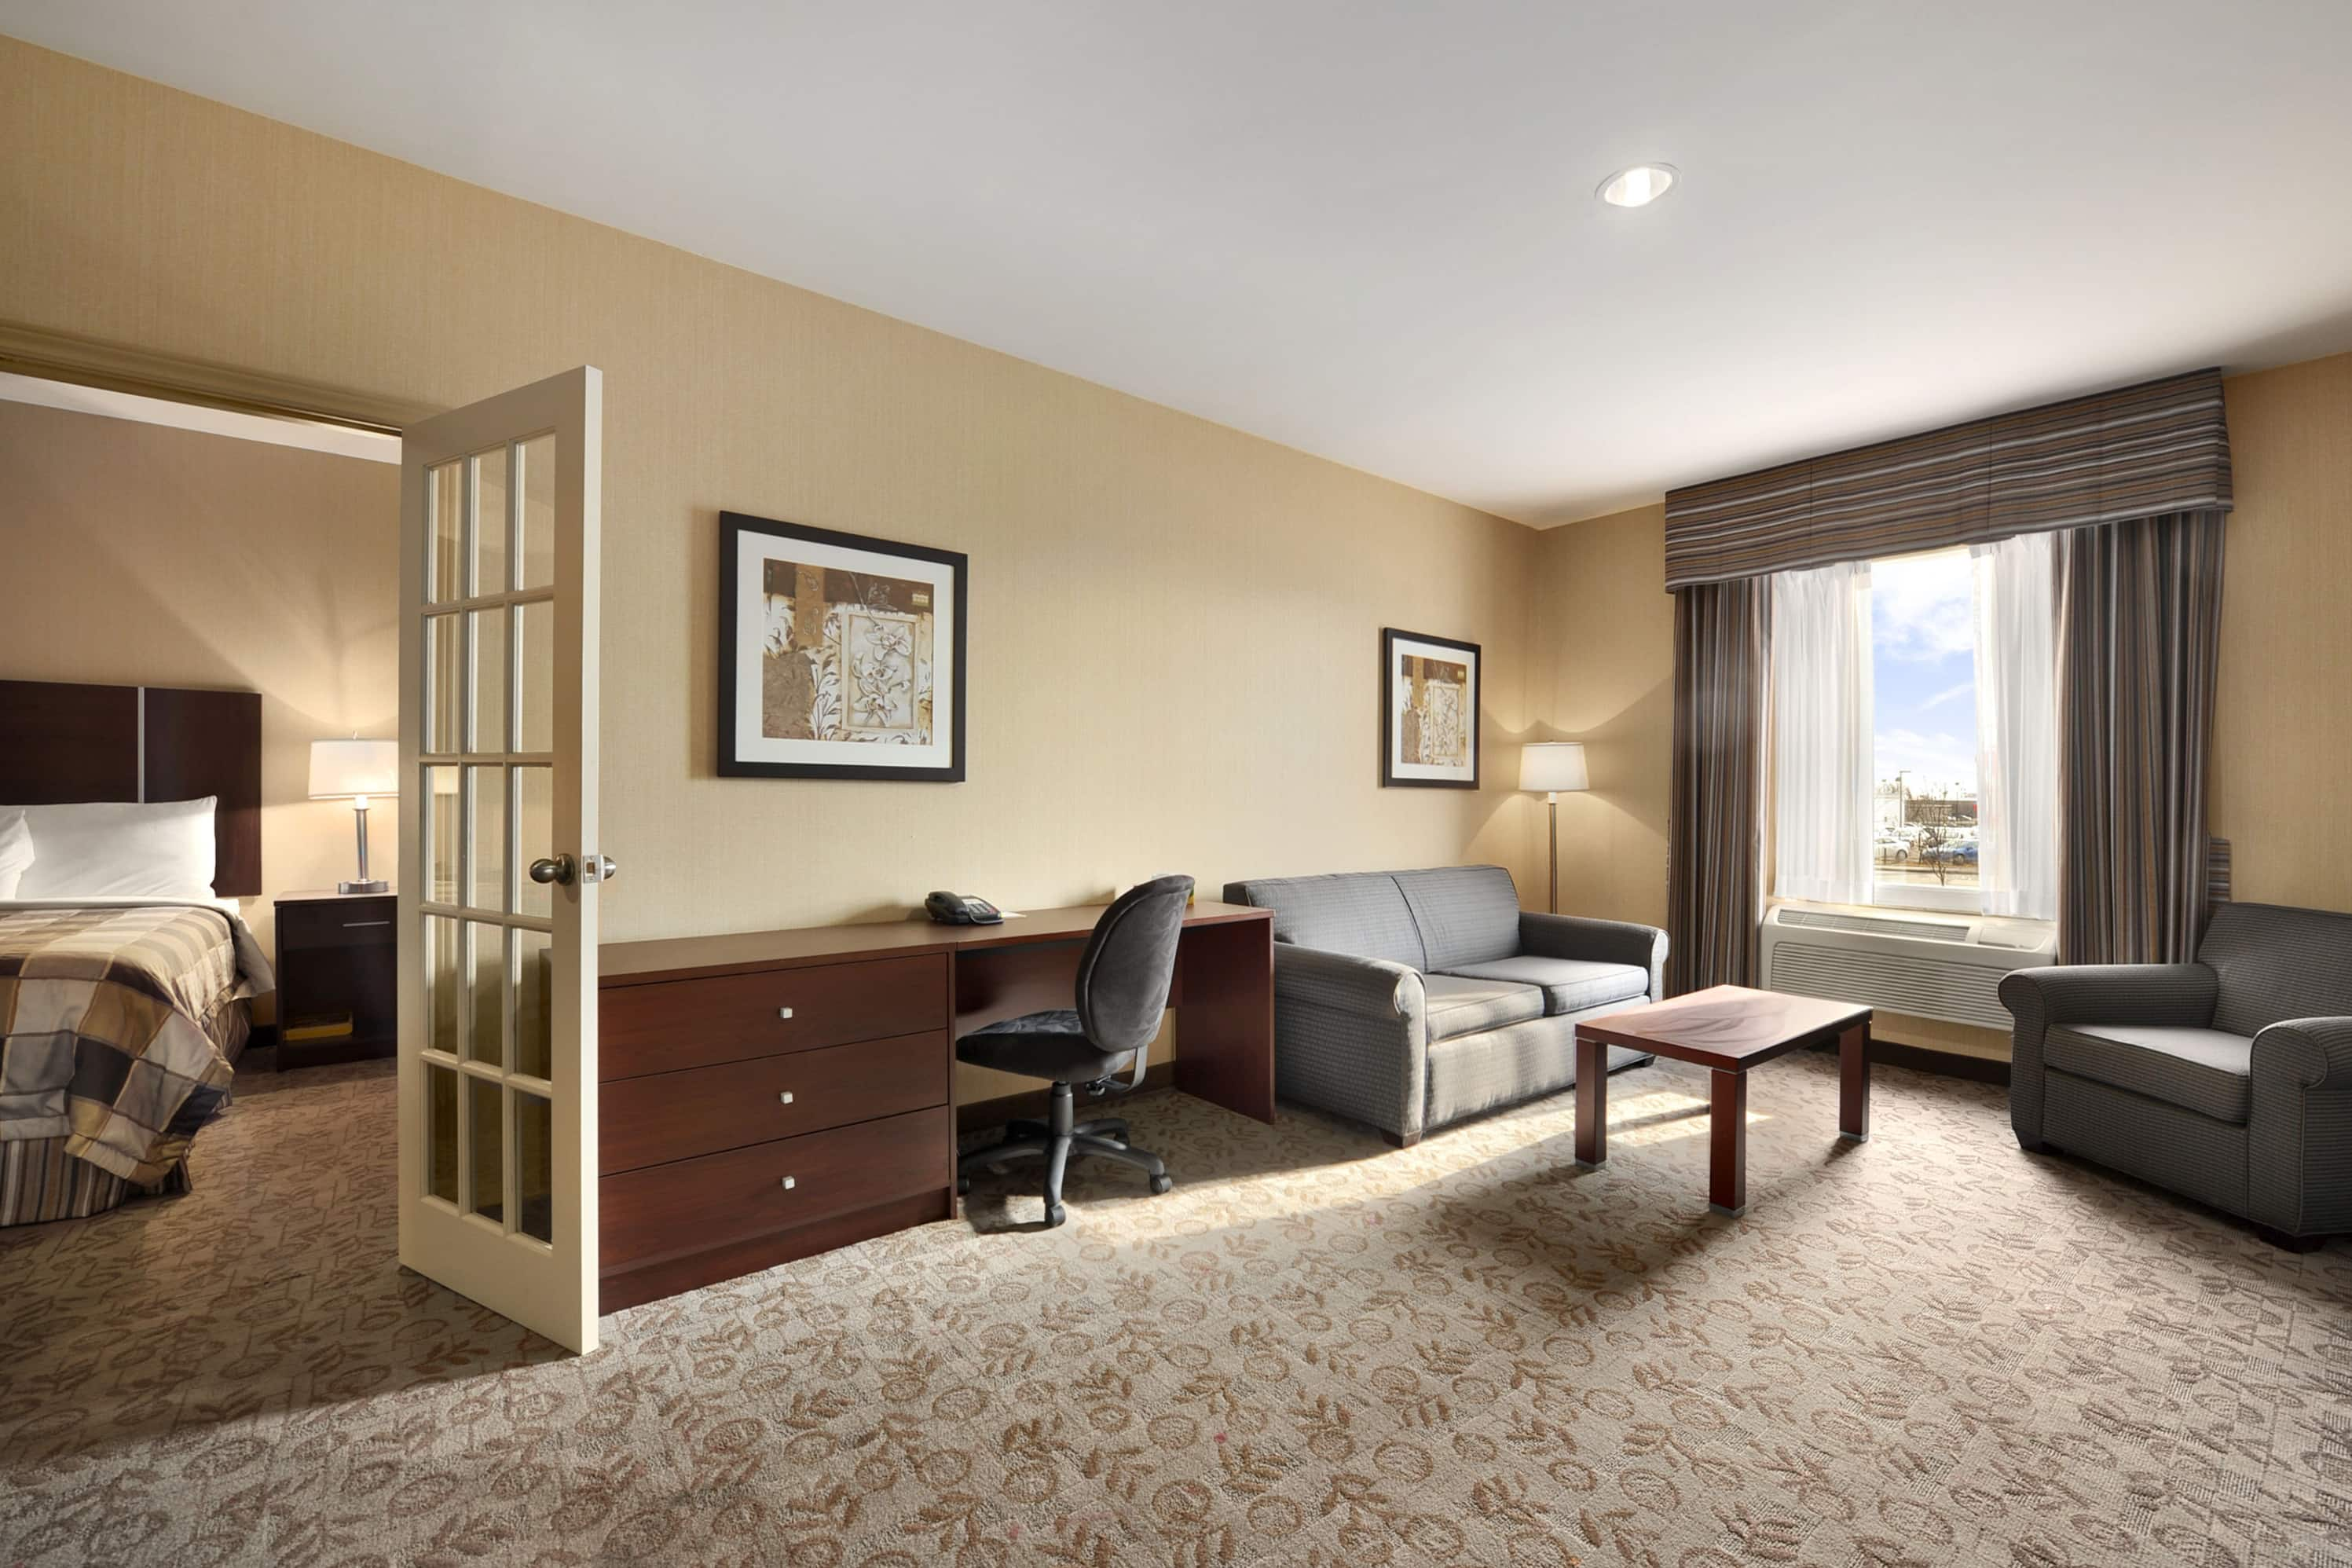 Guest room at the Days Inn Brampton in Brampton, Ontario